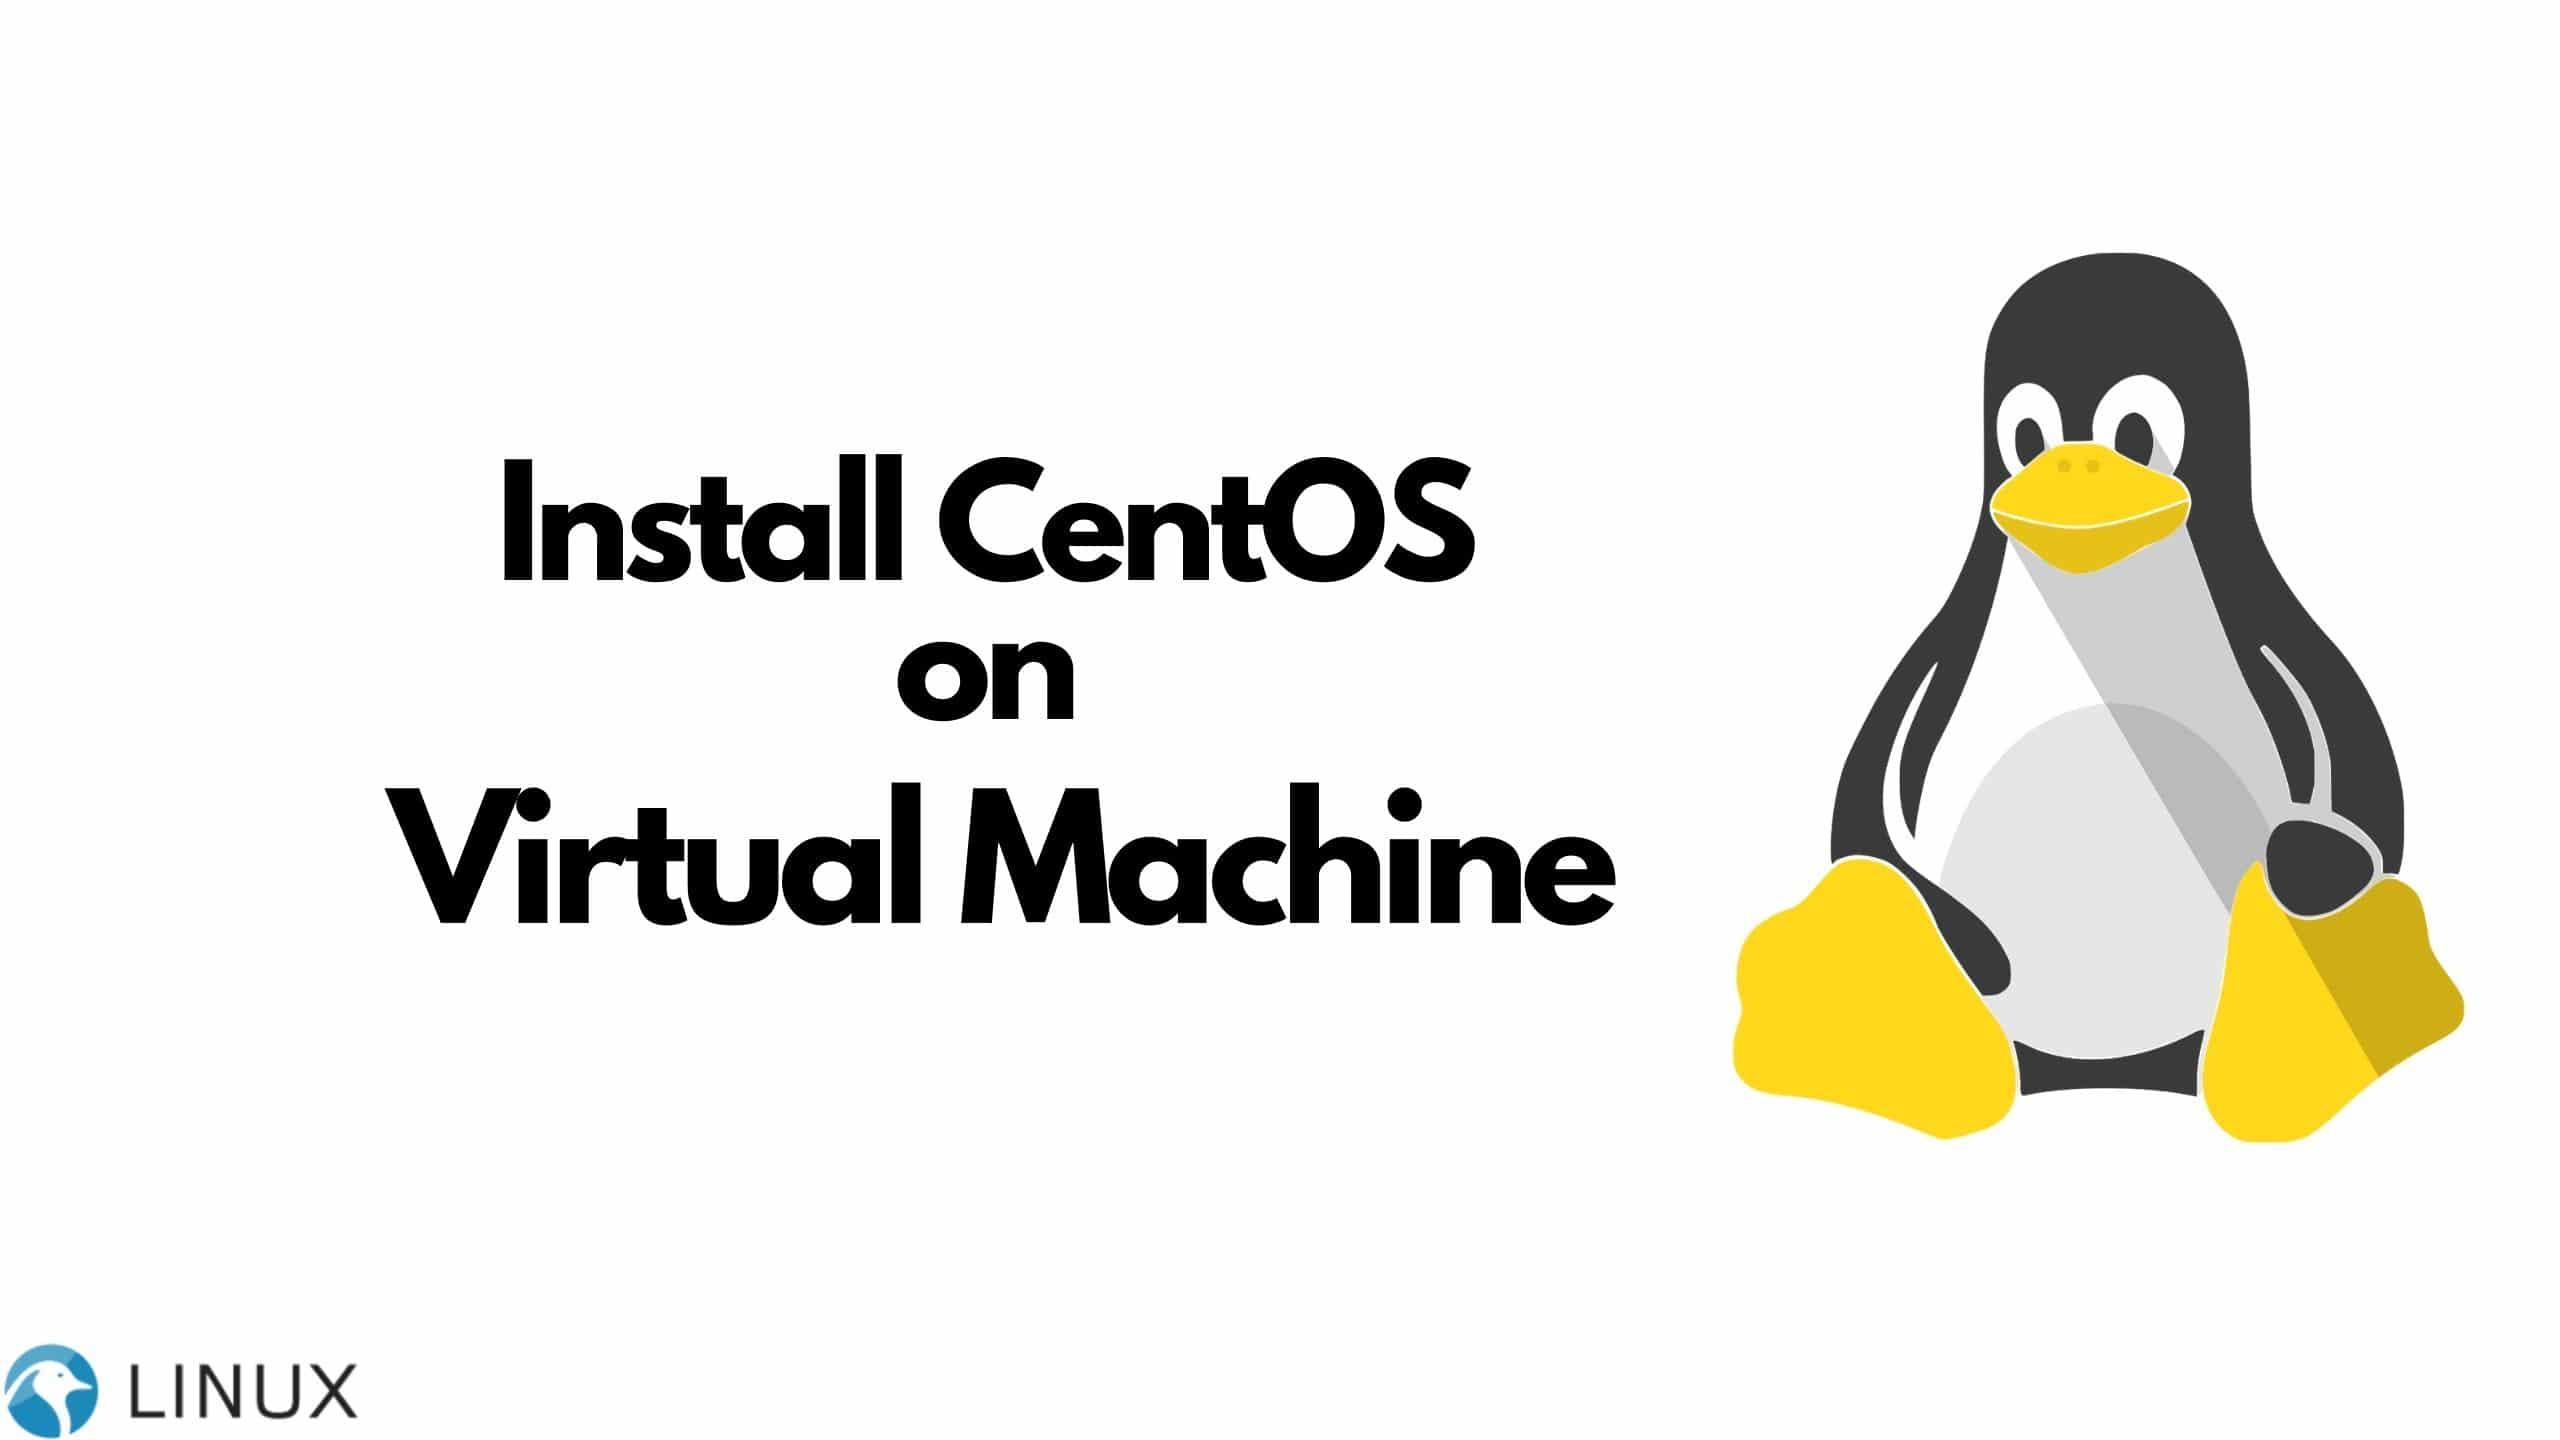 How to install CentOS on Virtual Machine?